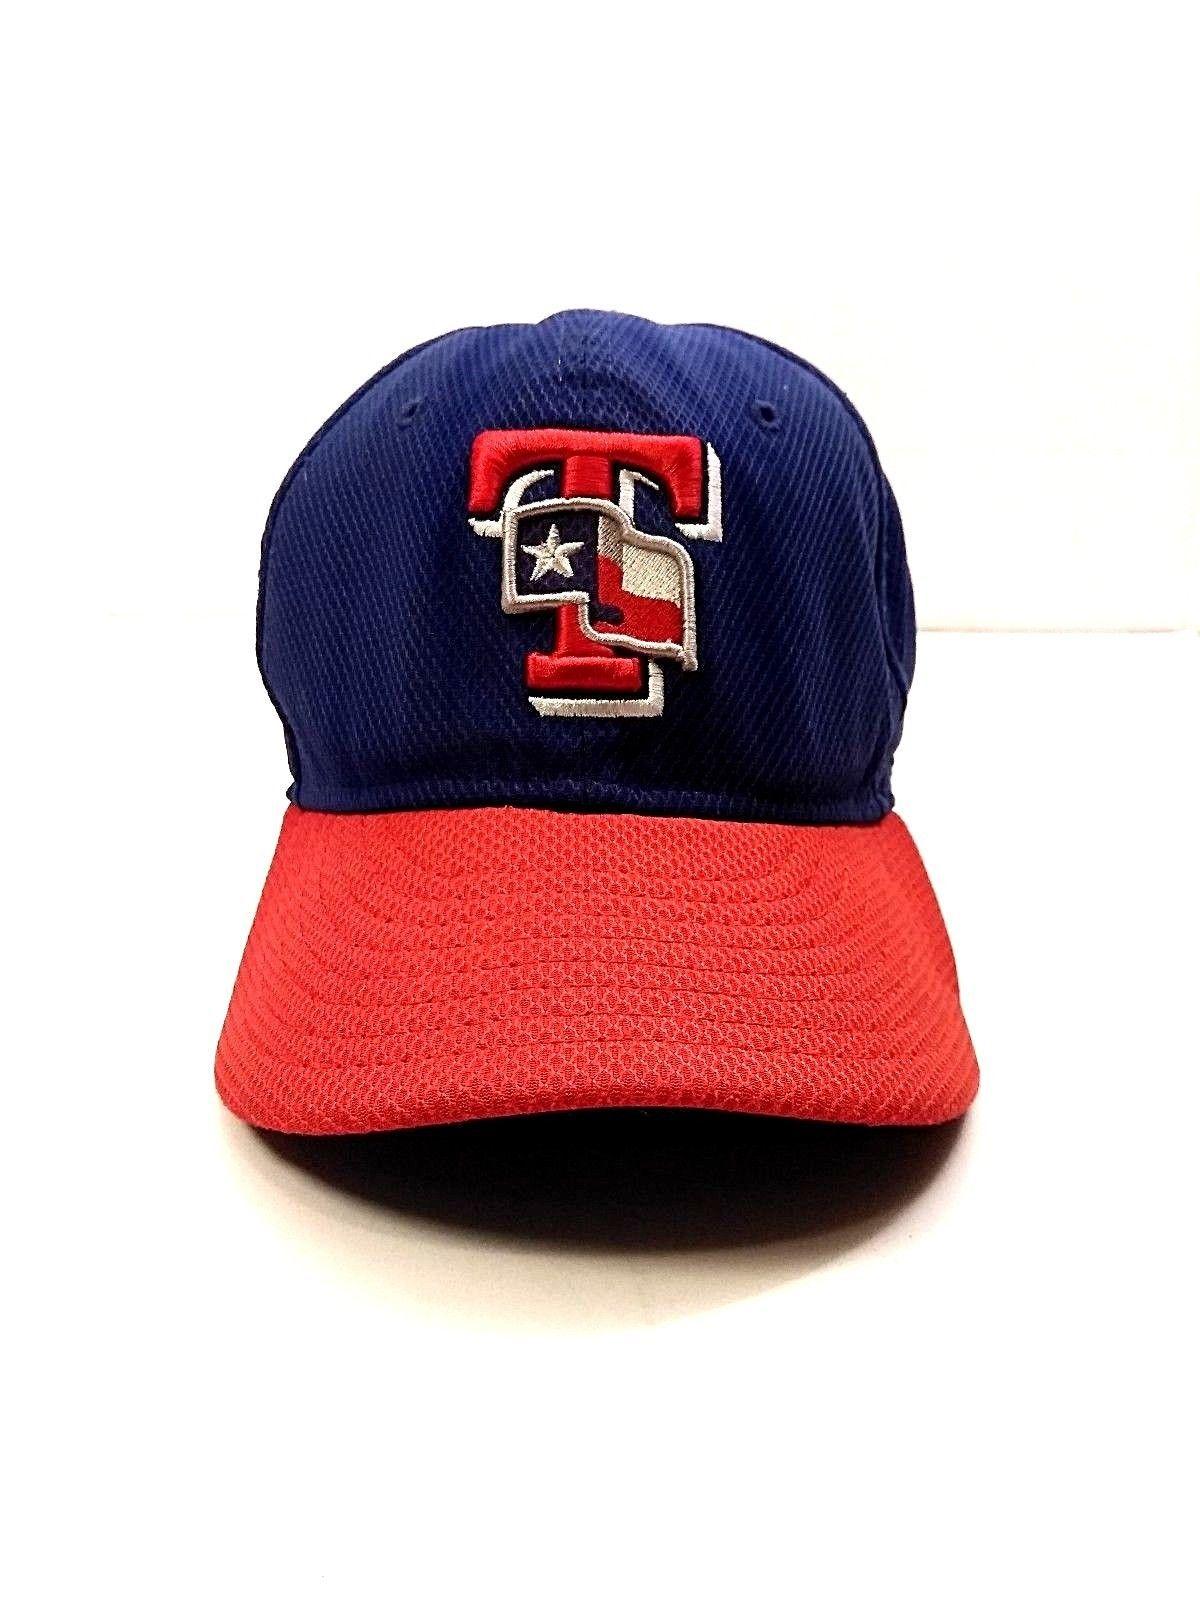 f07fa77d8ac Texas Rangers Baseball Cap Size 7 1 2 New and 50 similar items. 57